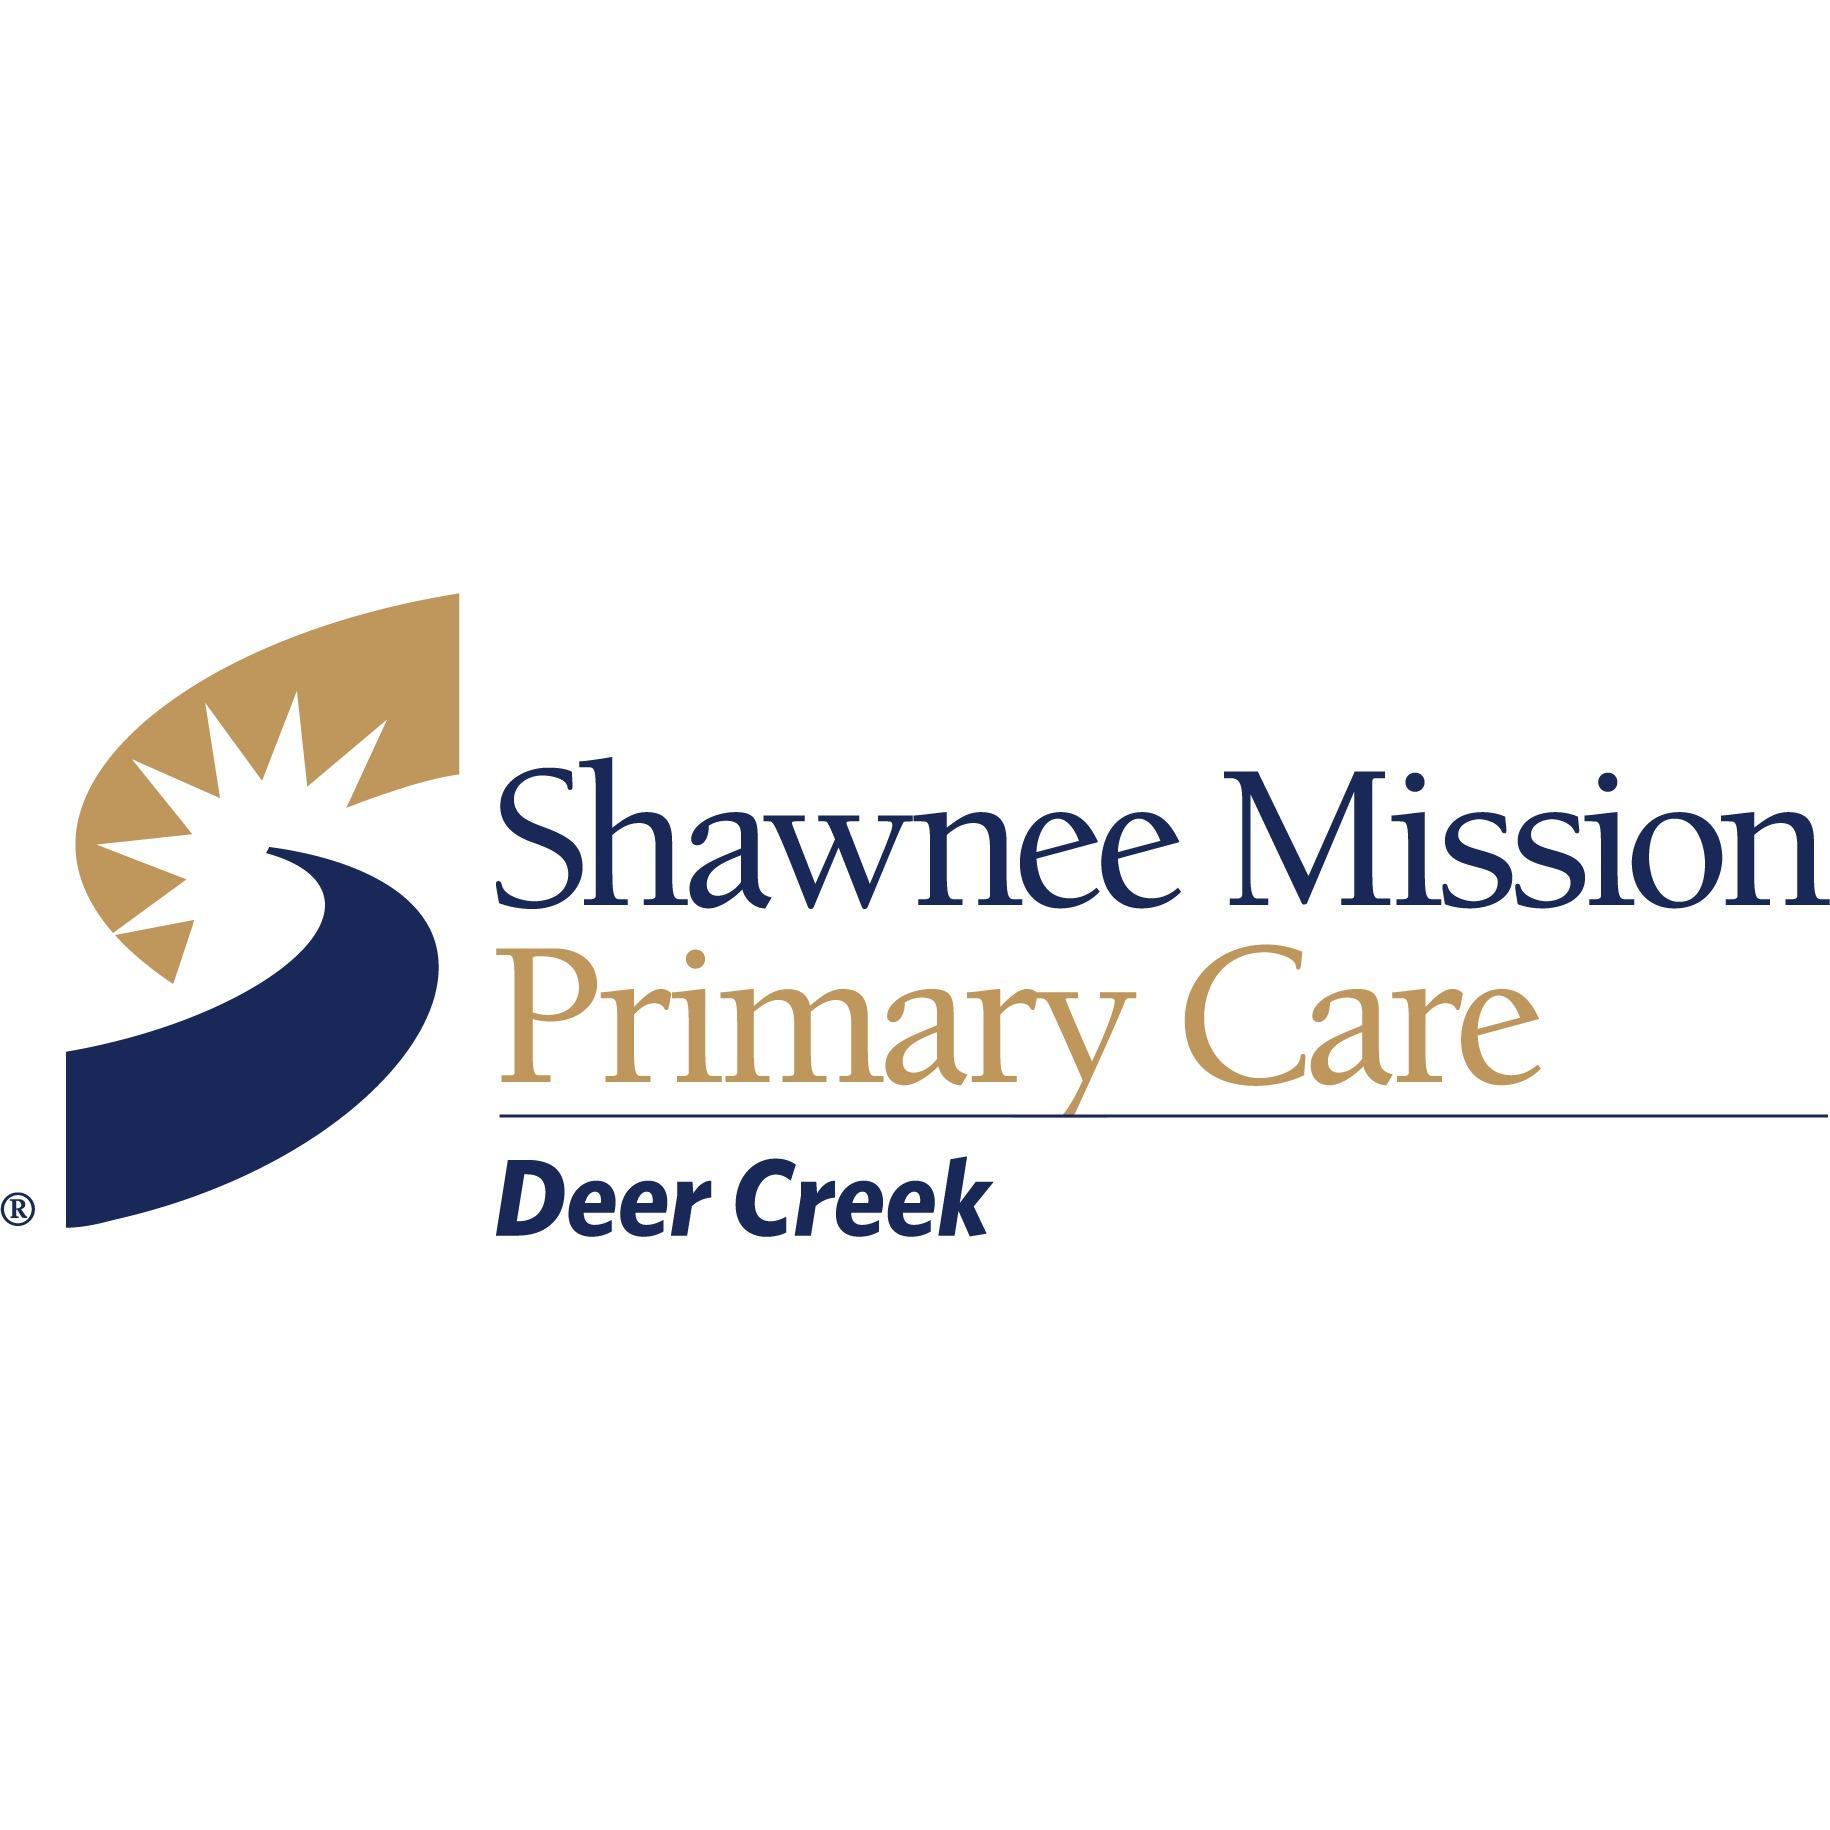 Shawnee Mission Primary Care - Deer Creek